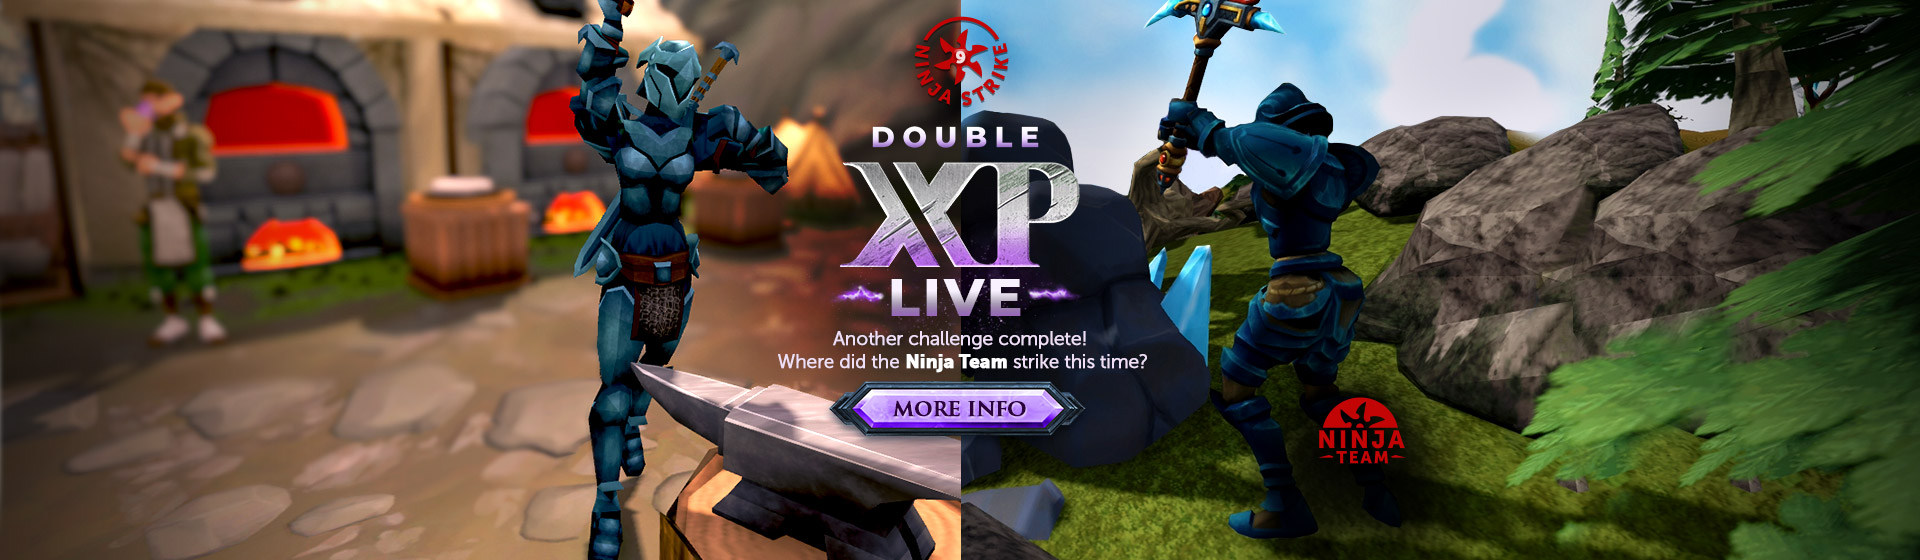 Ninja Strike 9 - Double XP LIVE